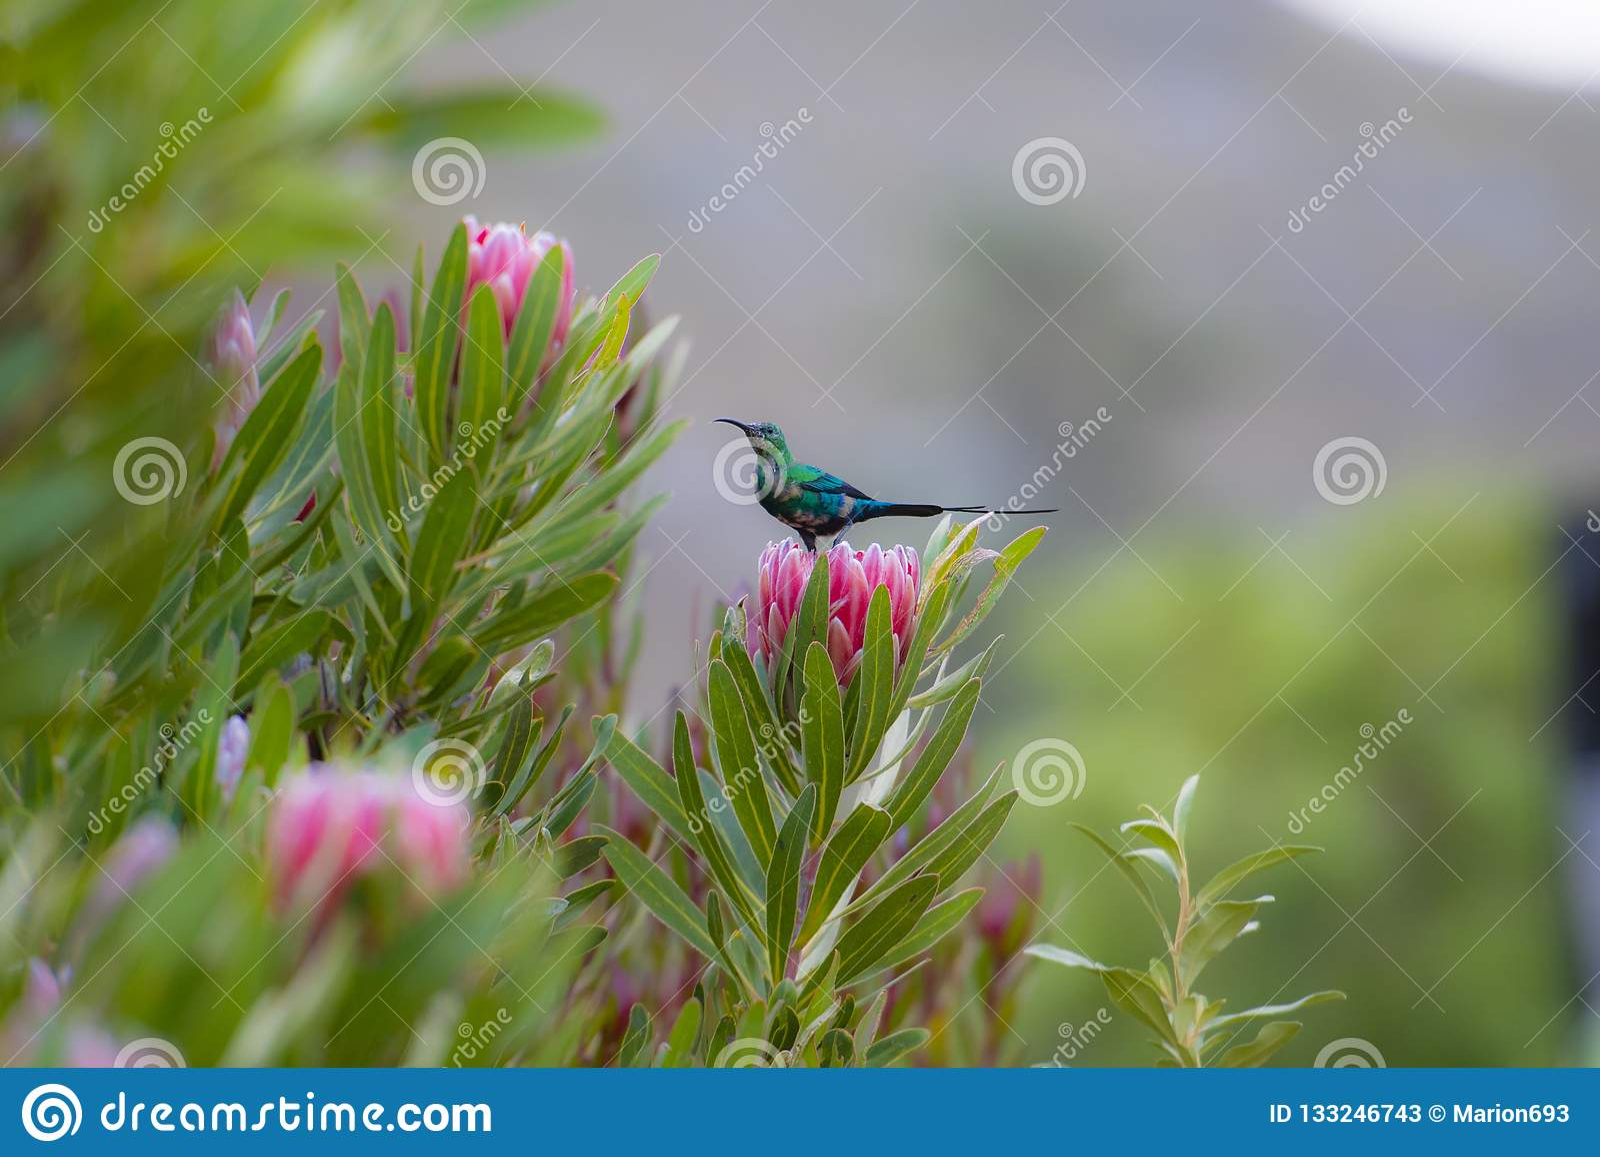 Non multiplication du famosa de Nectarinia de sunbird de malachite regardant la gauche, se reposant sur la fleur rose de protea